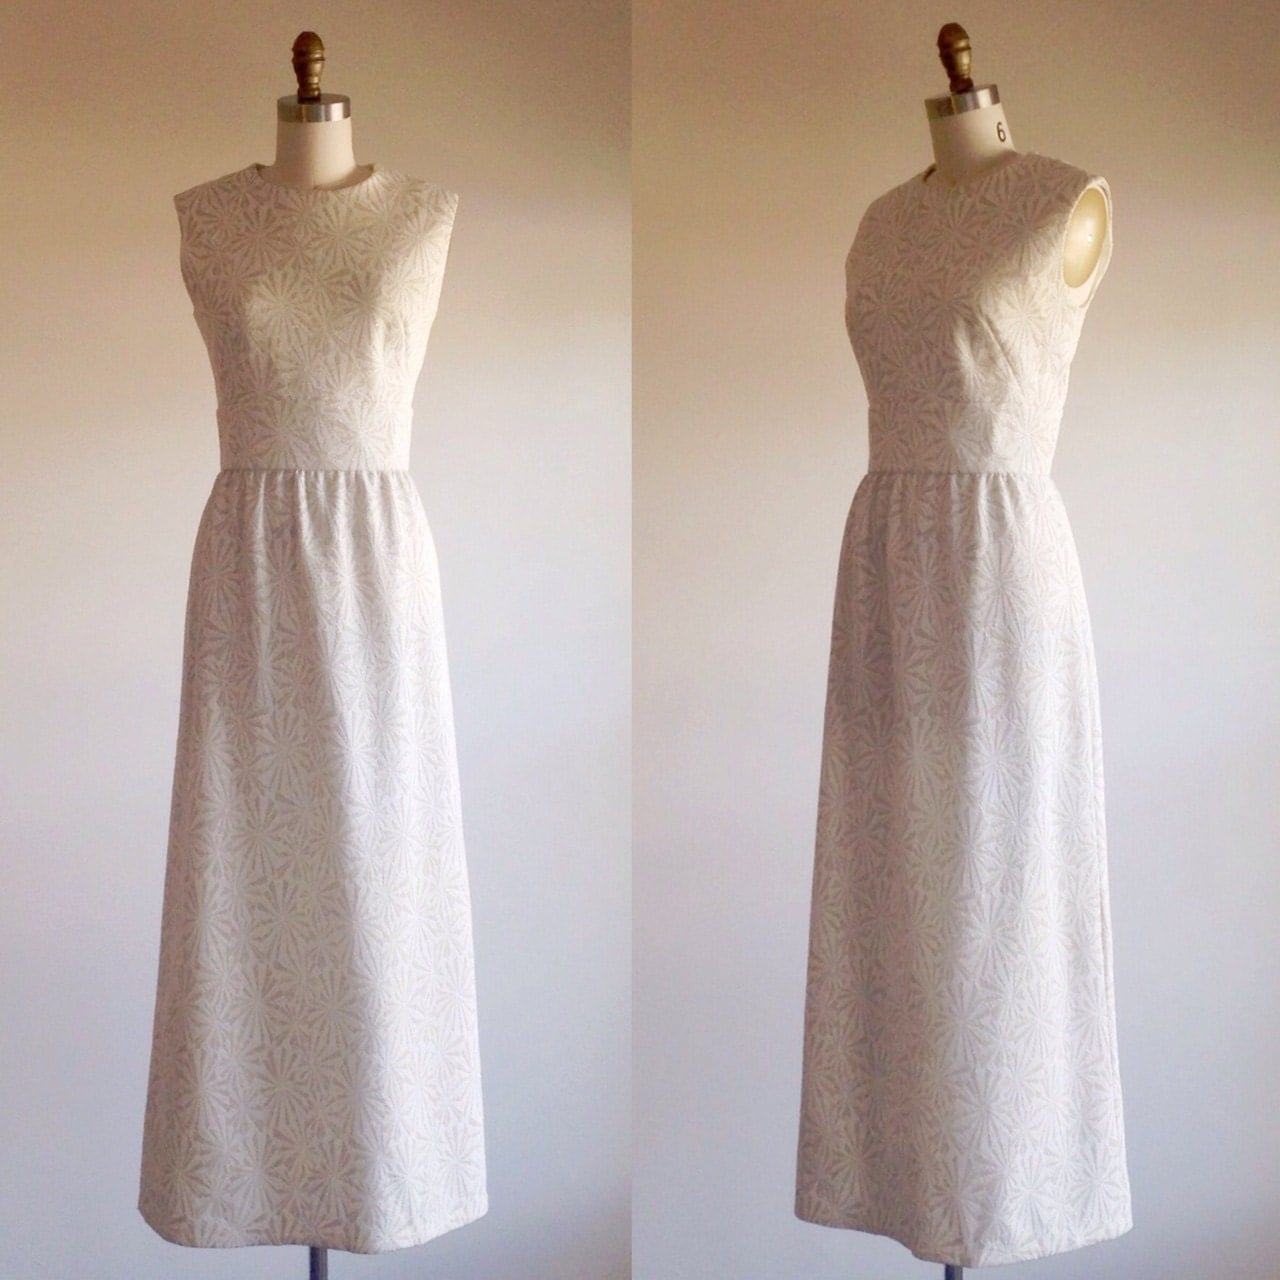 White Wedding Dress Simple Wedding Dress Boho Wedding Dress